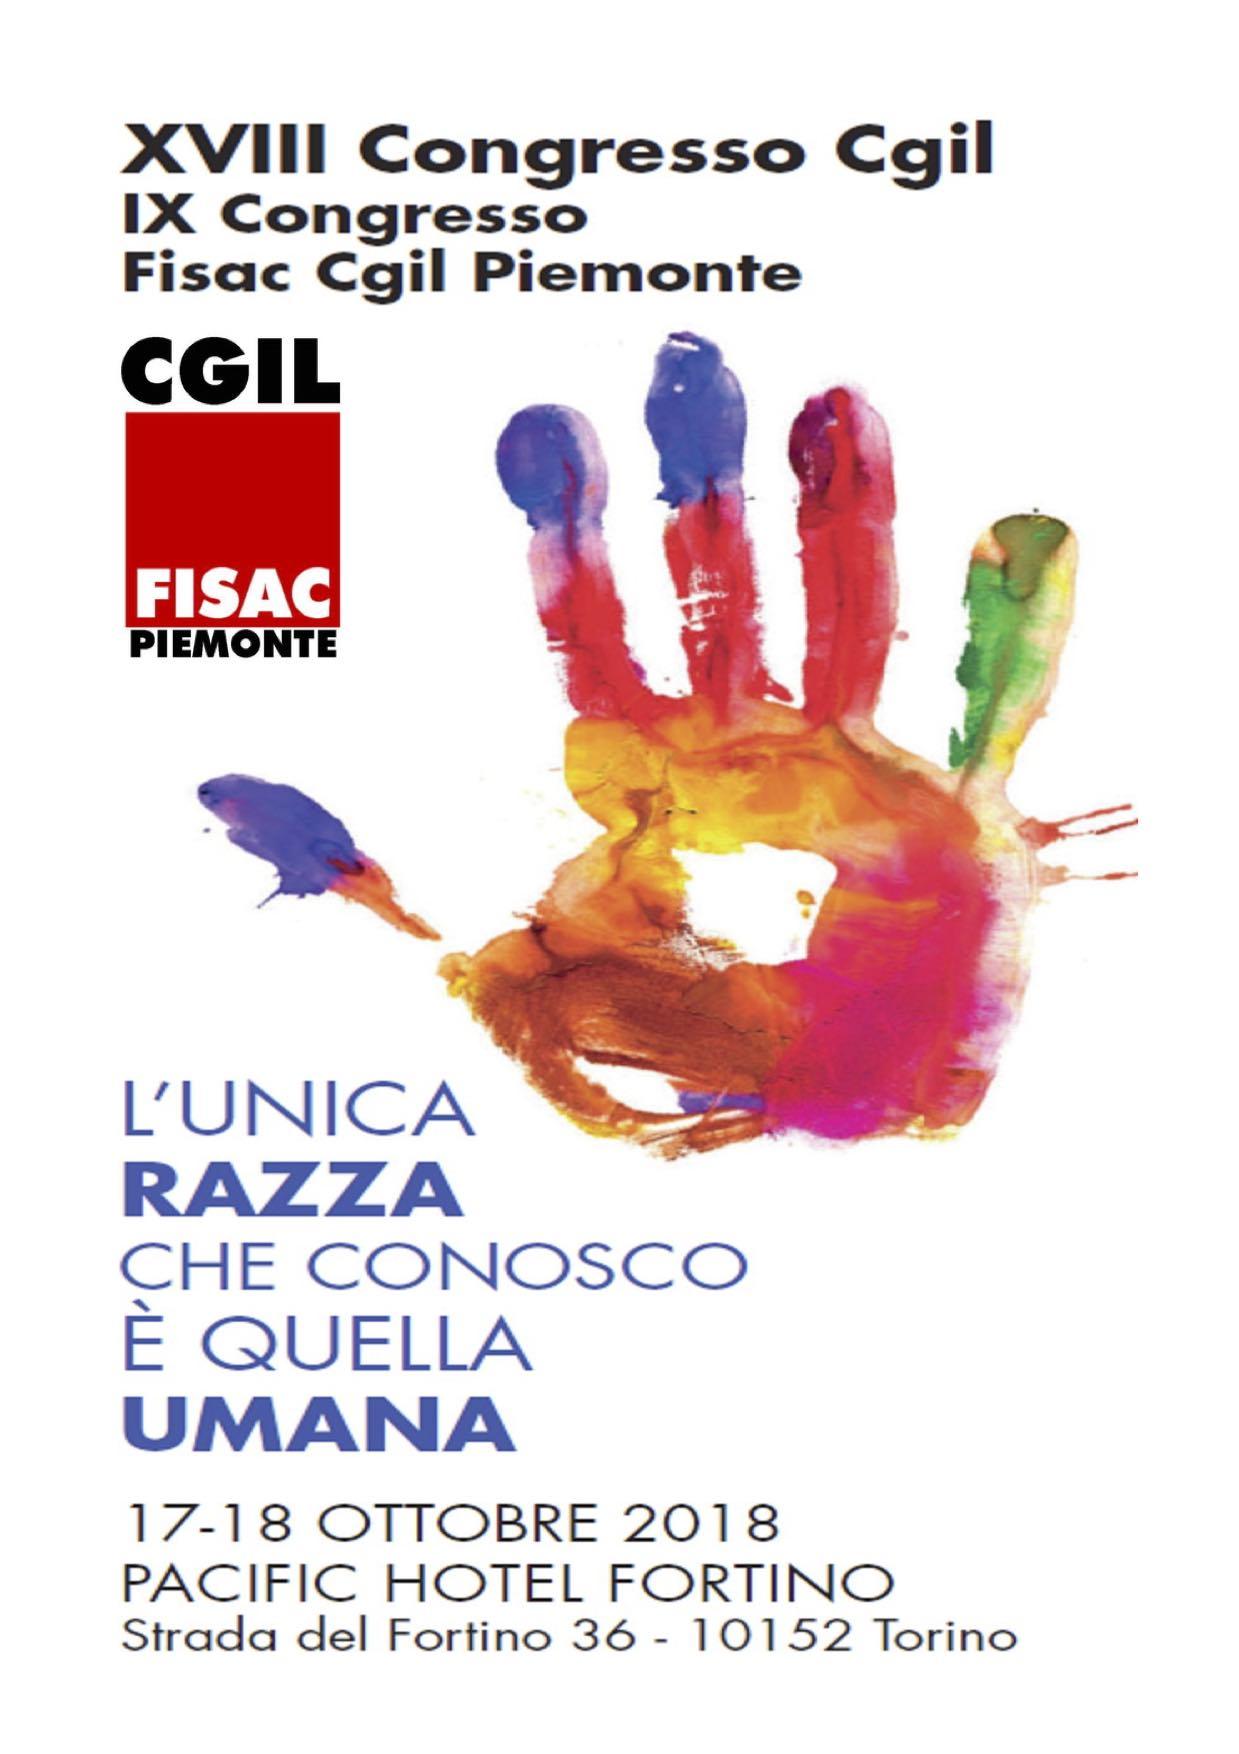 IX CONGRESSO FISAC CGIL PIEMONTE